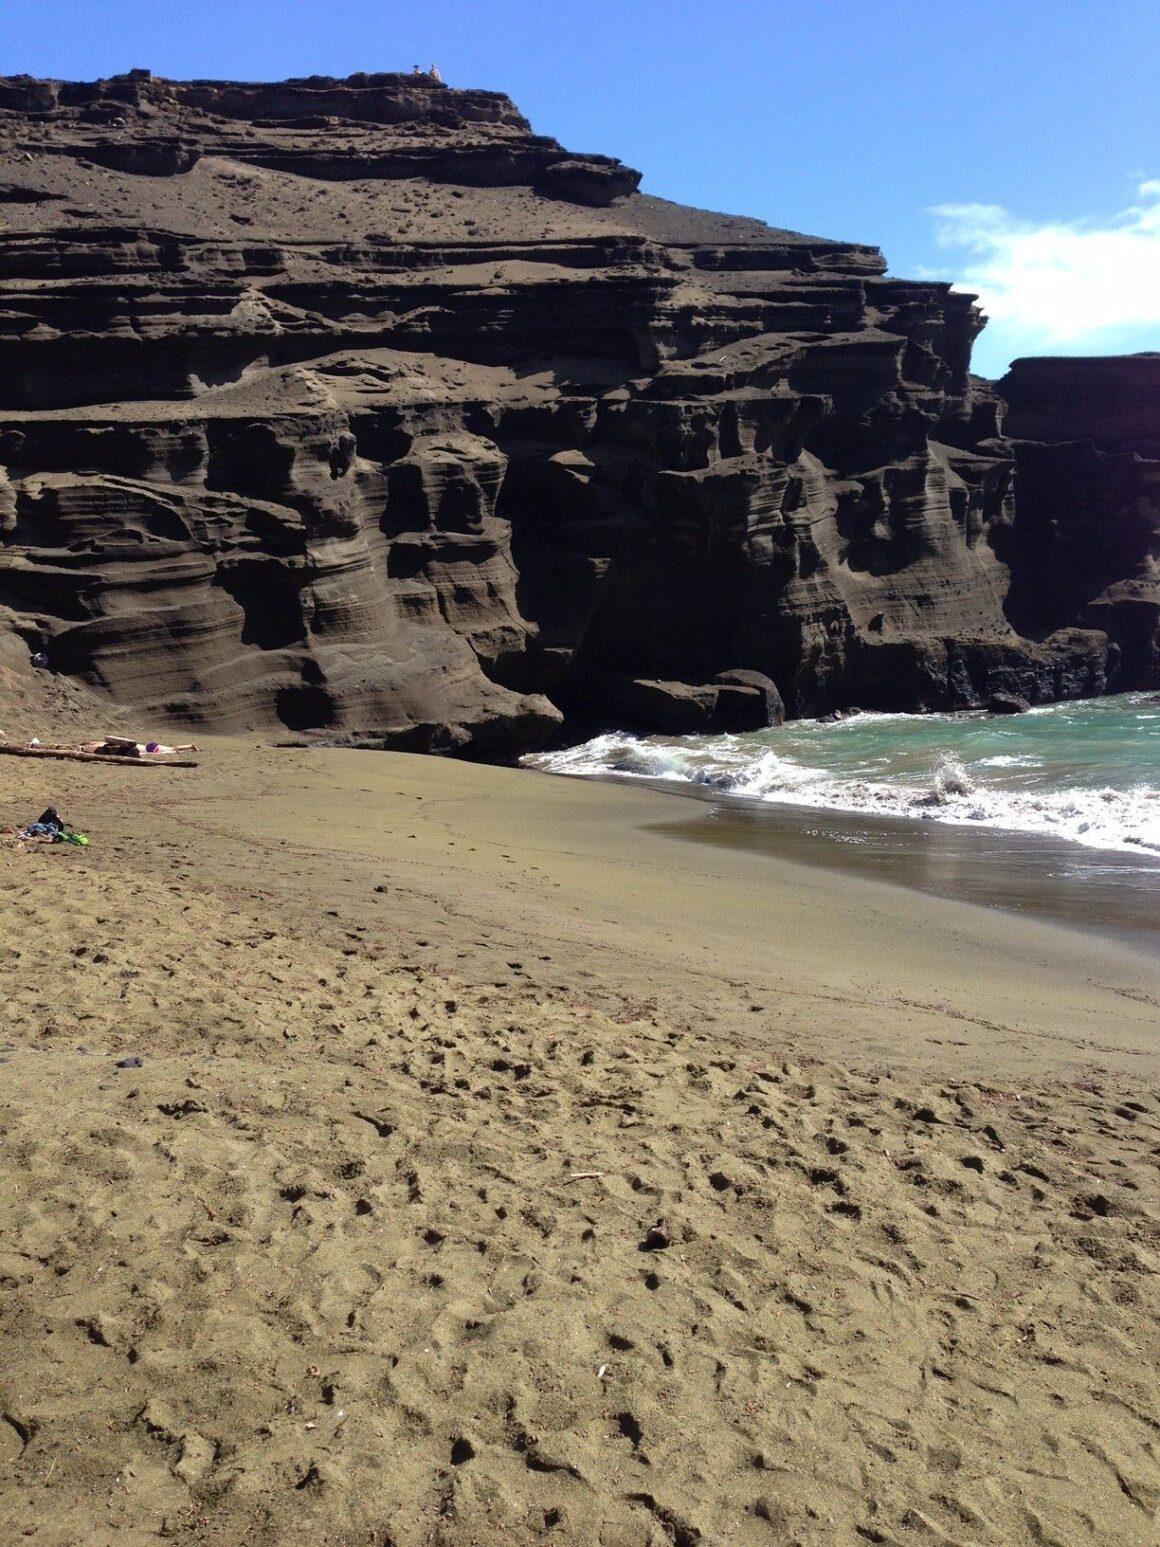 Green Sand Beach 2 at Hawaii's South Point